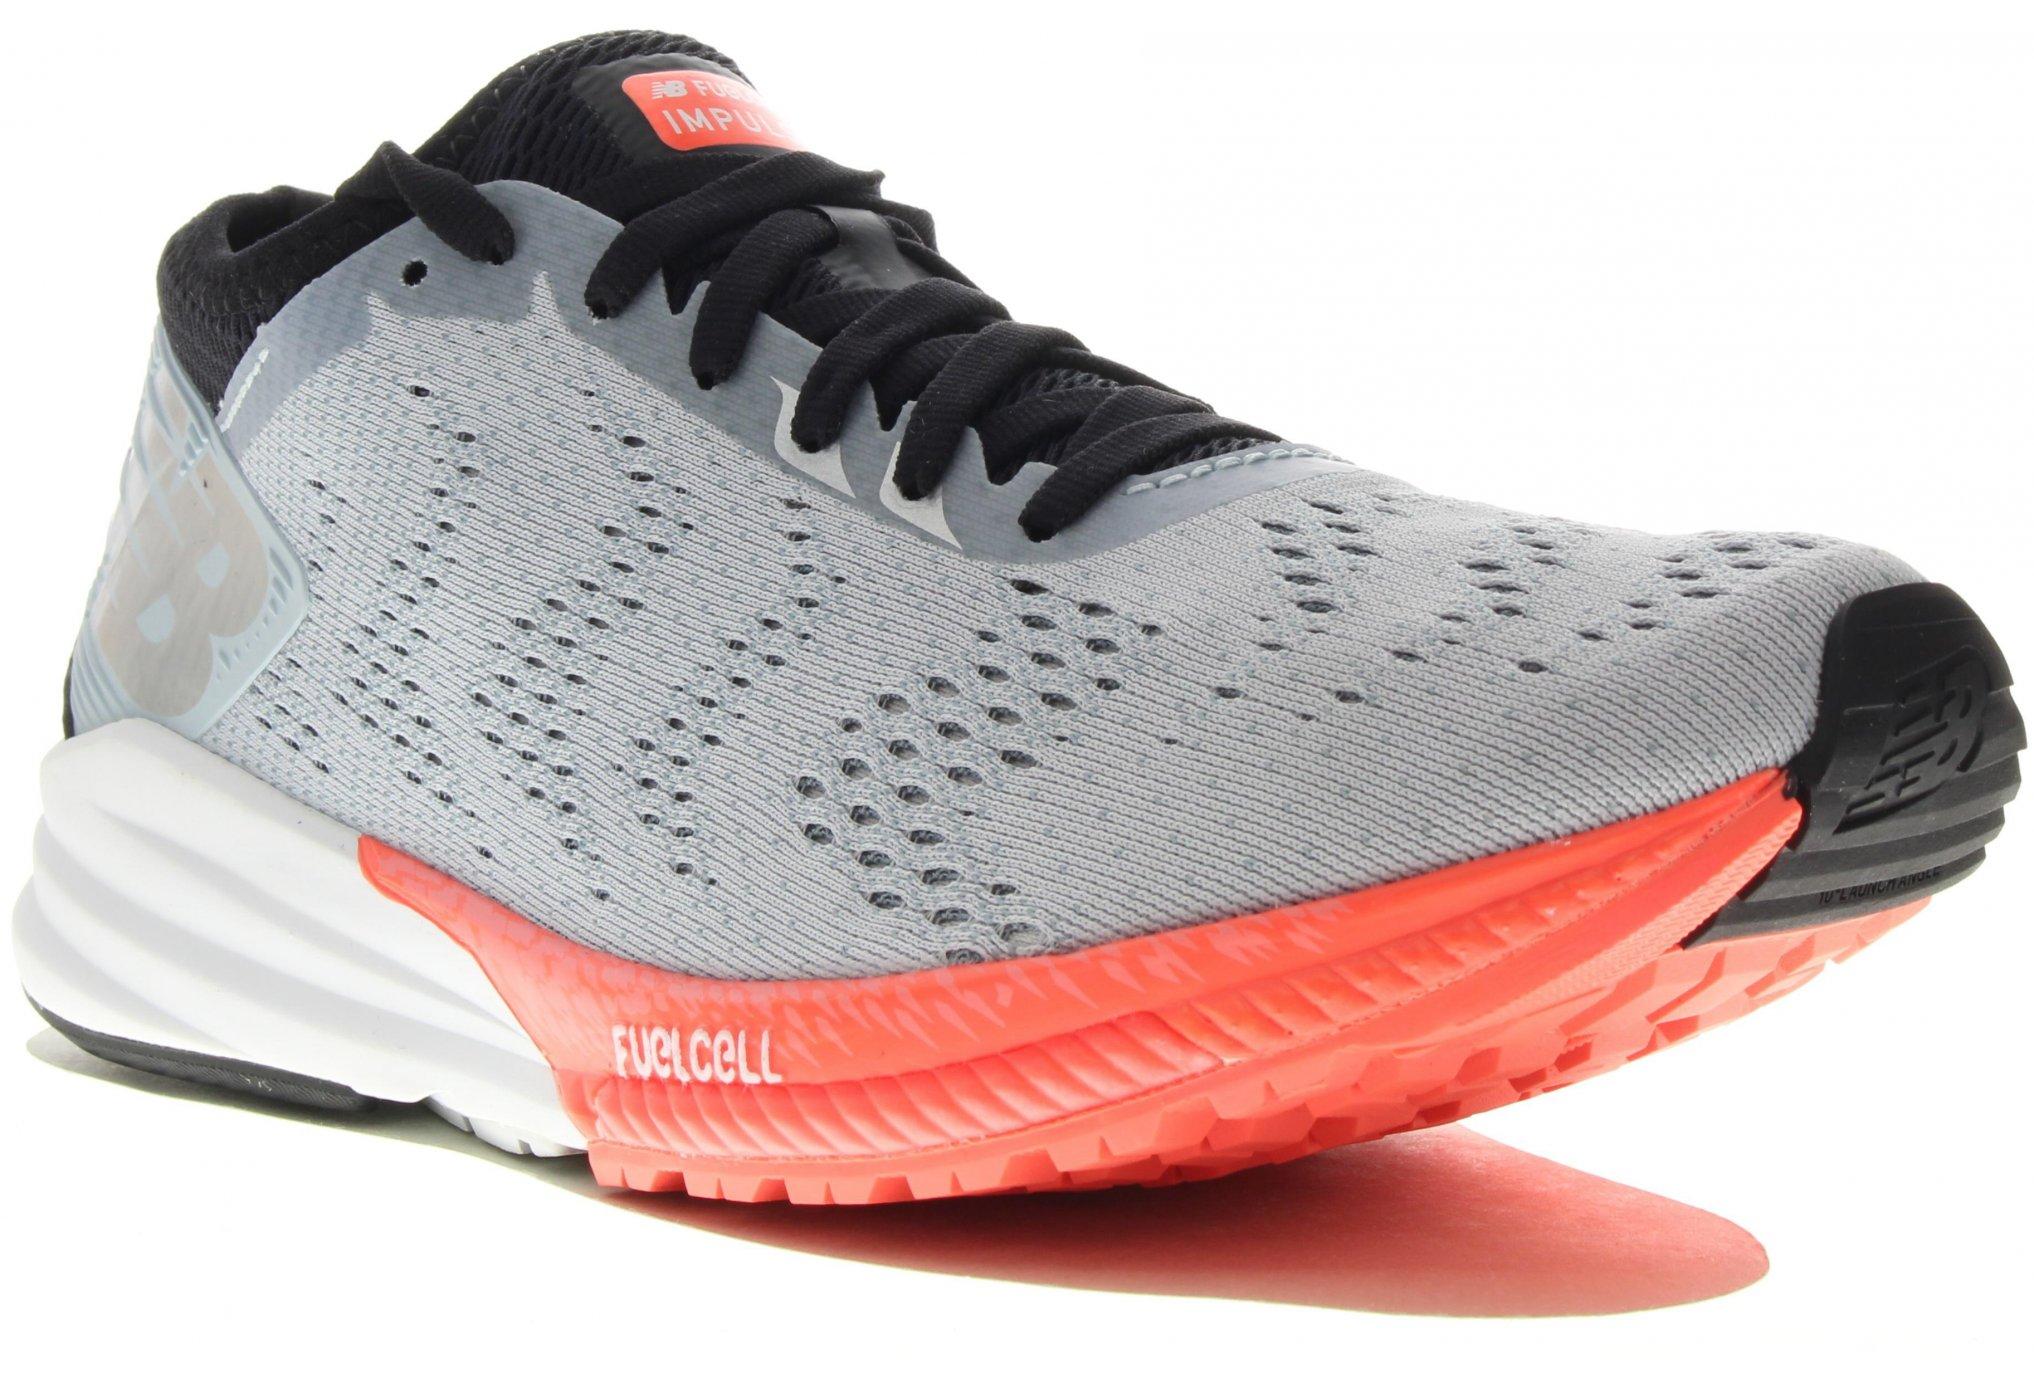 New Balance FuelCell Impulse Chaussures running femme